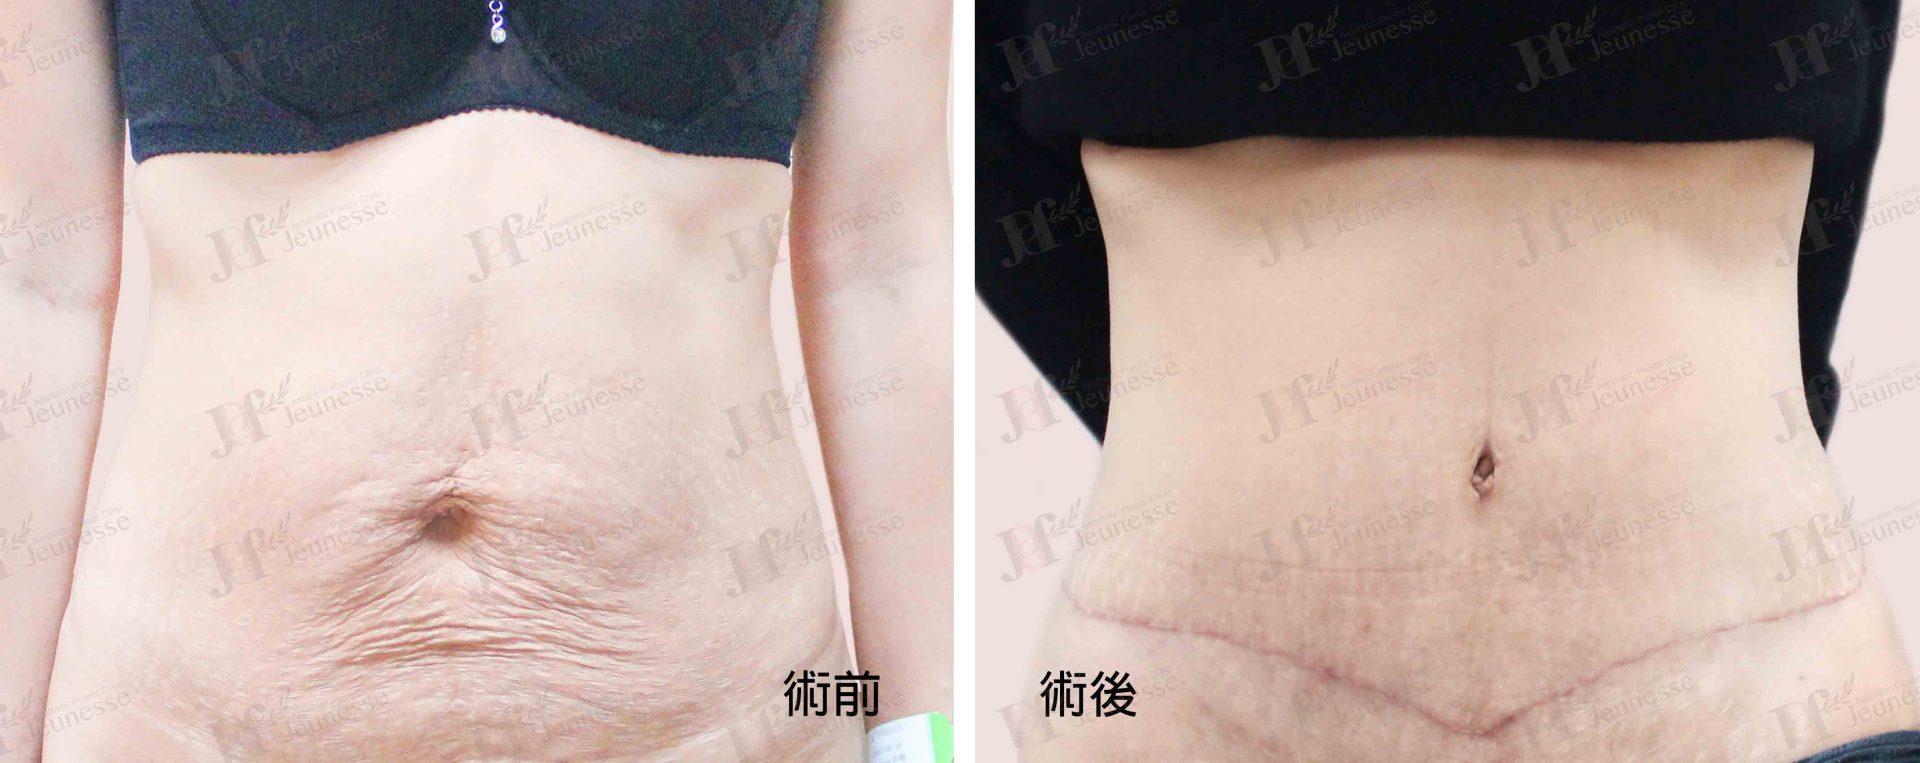 Abdominoplasty腹部成形術及抽脂手術 case 5 正面-浮水印